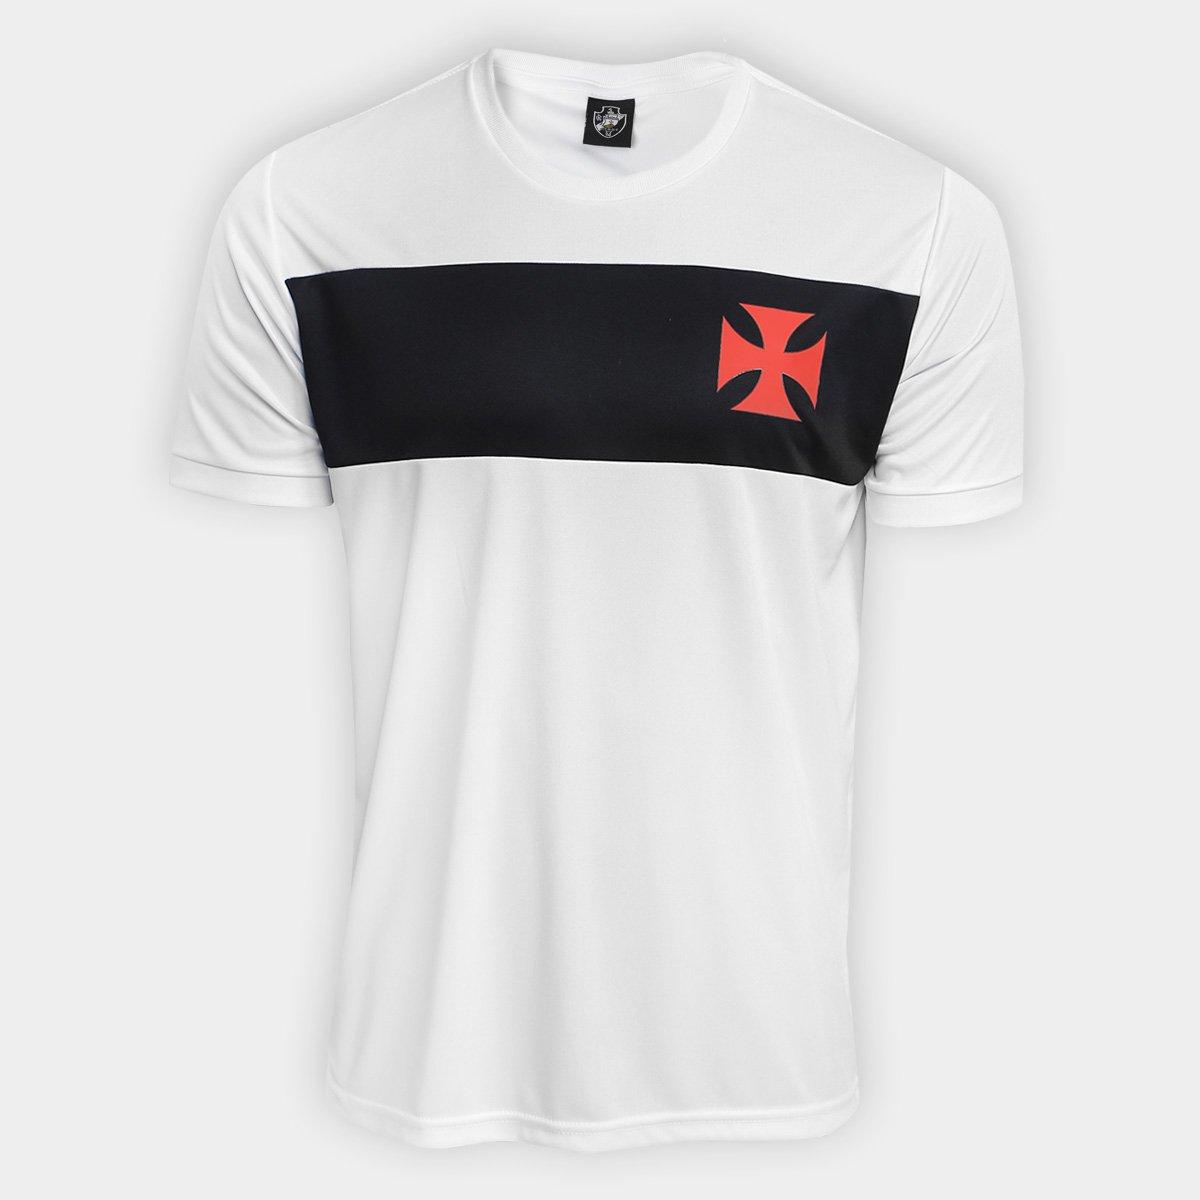 0a9c502733ab7 Camisa Vasco Dry Recortes Classic Masculina - Branco e Preto - Compre Agora